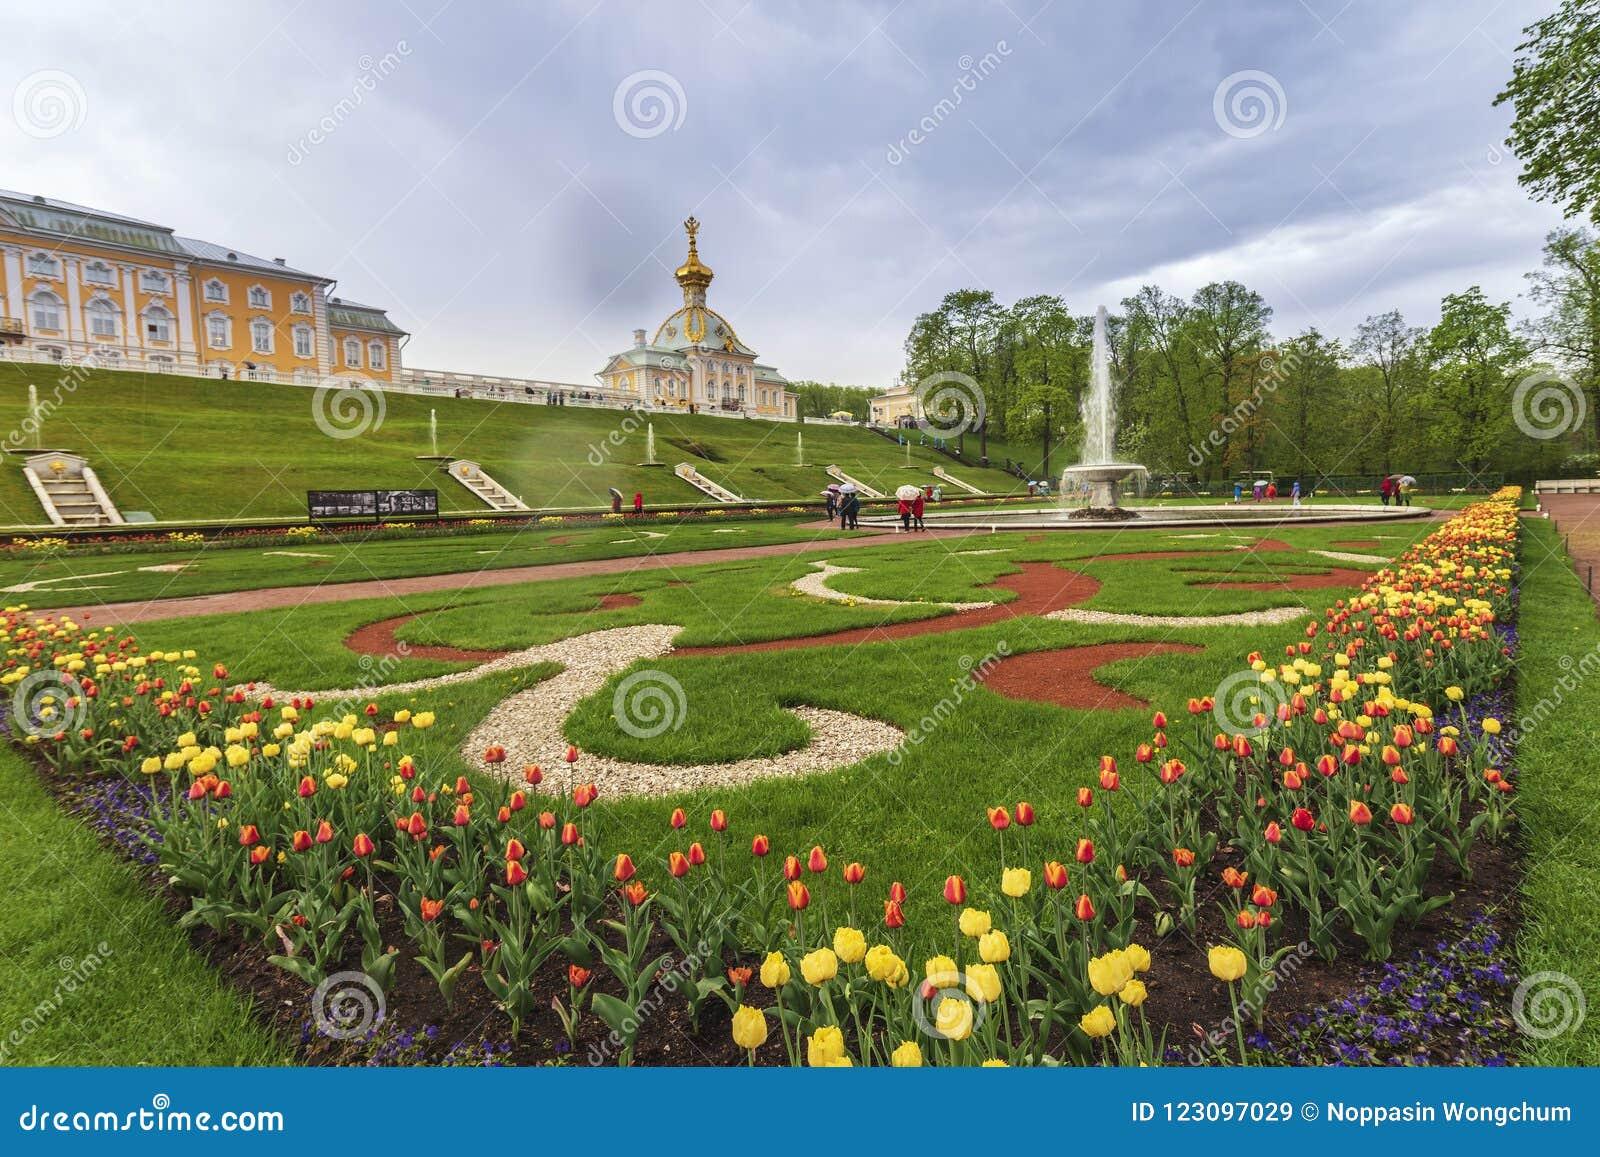 Download Peterhof Palace Saint Petersburg Russia Editorial Stock Image    Image Of Skyline, Garden: